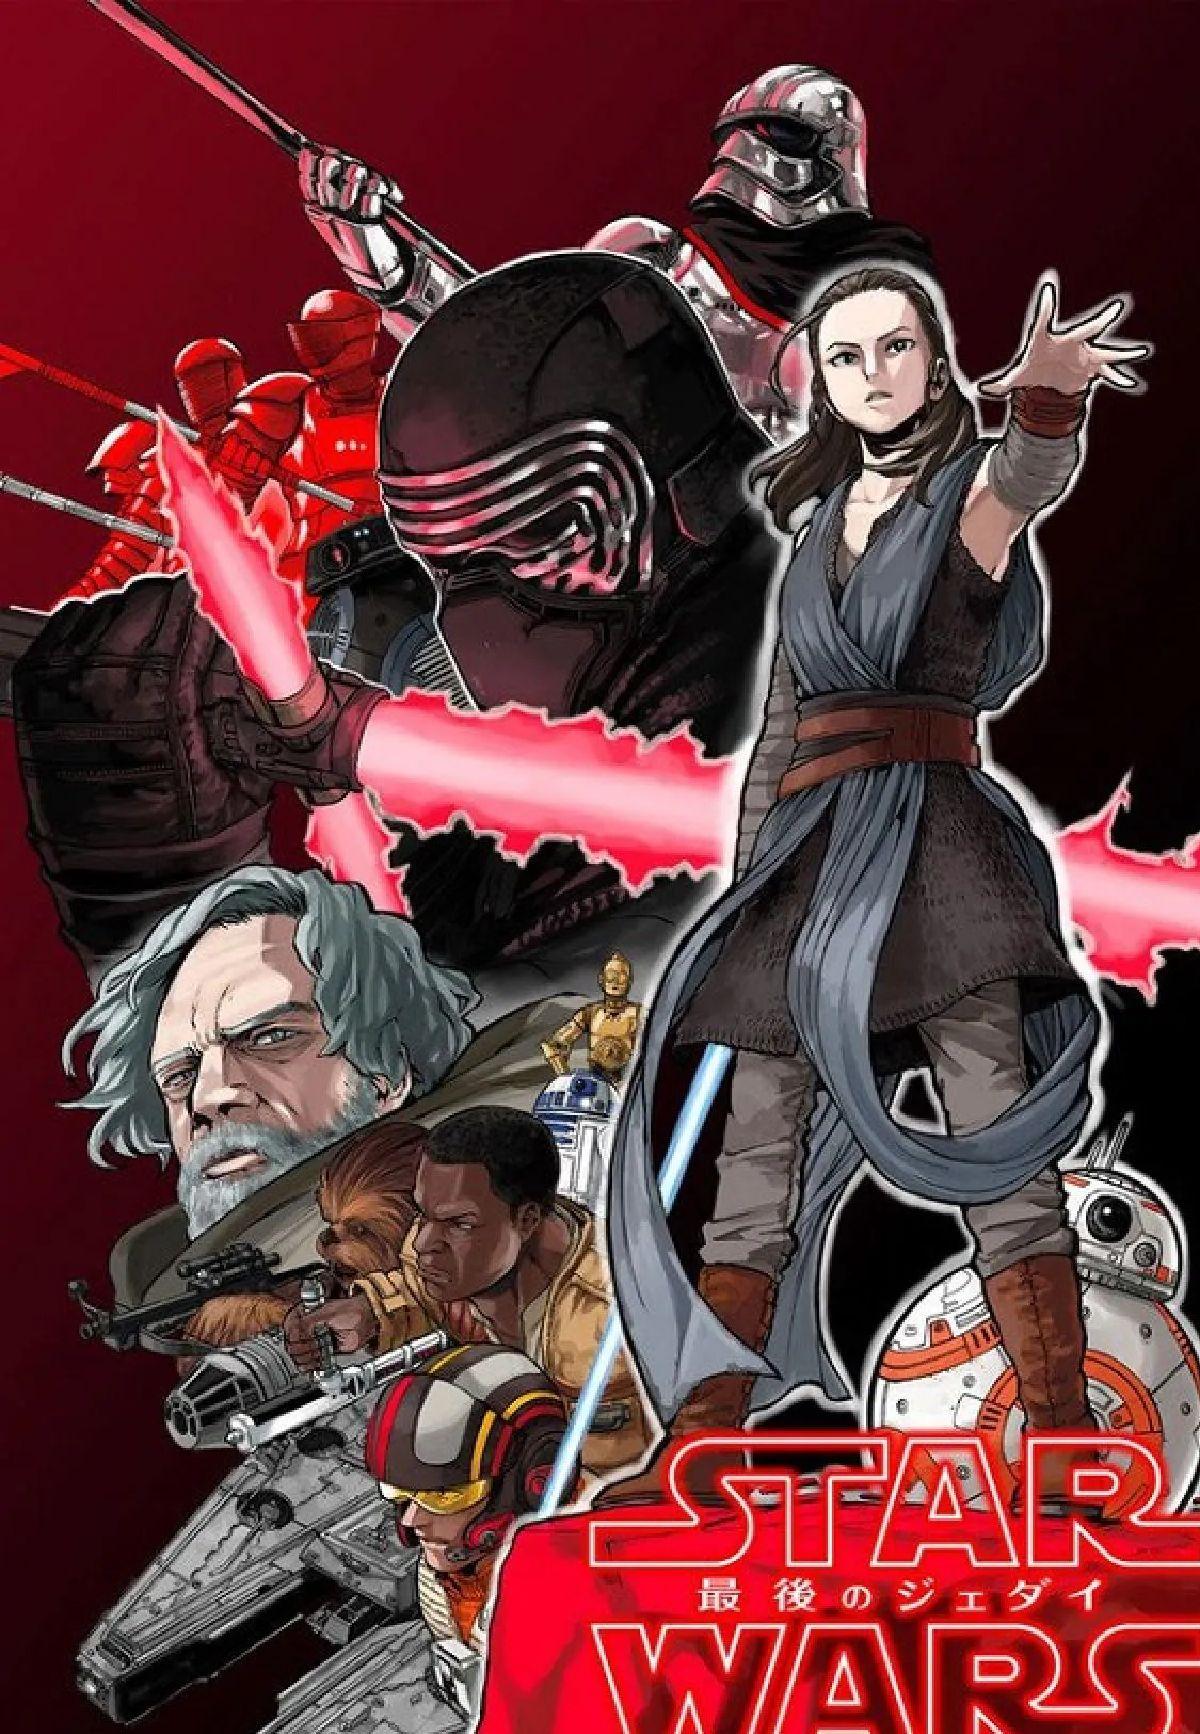 personajes de my hero academia star wars